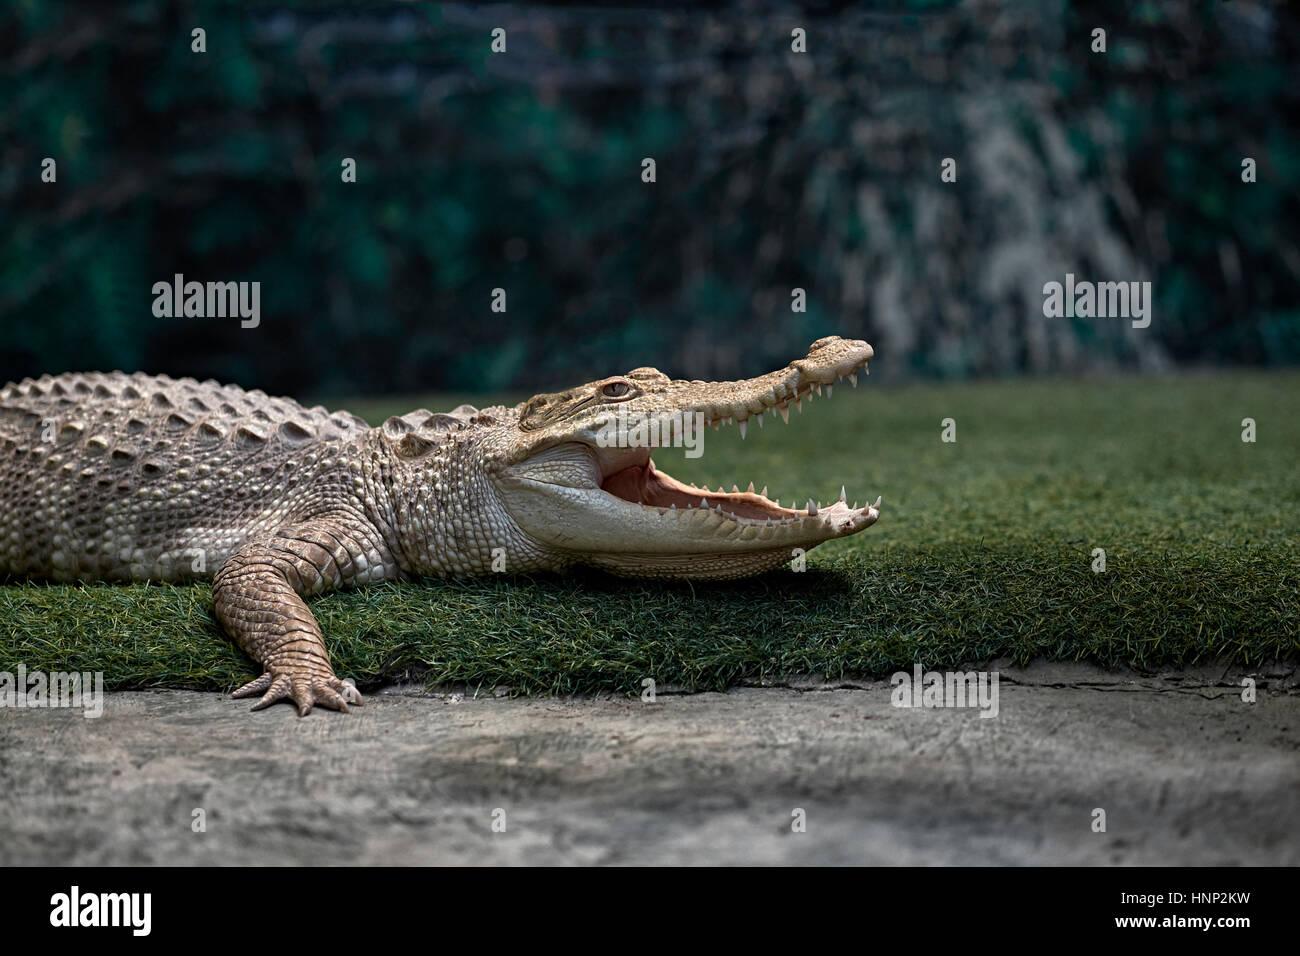 Albino Crocodile, (Crocodylinae), mouth open, Thailand, Southeast Asia - Stock Image